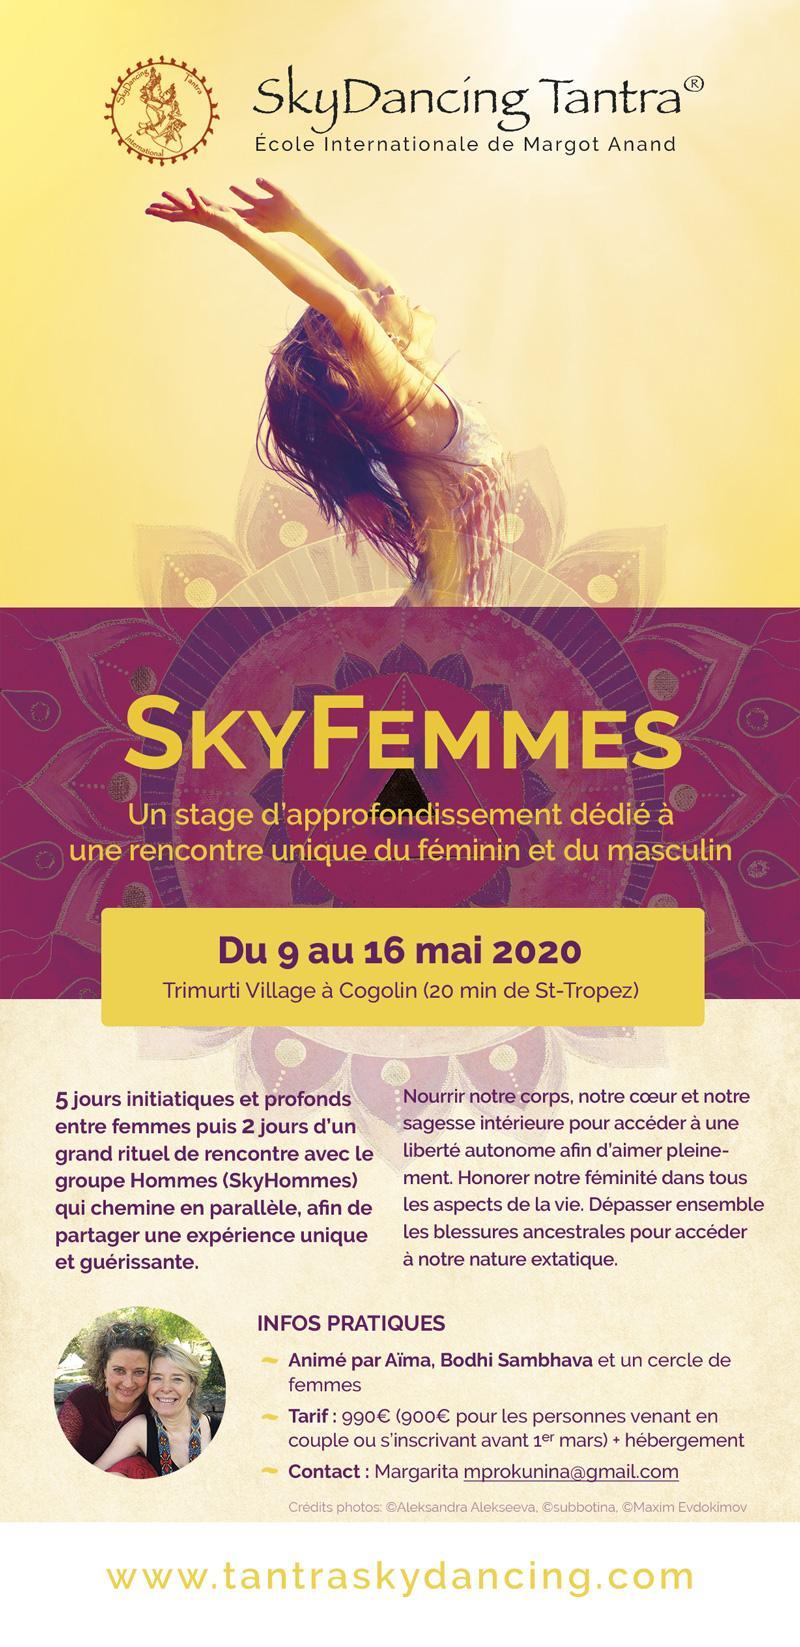 SkyHommes-SkyFemmes du 9 au 16 mai 2020